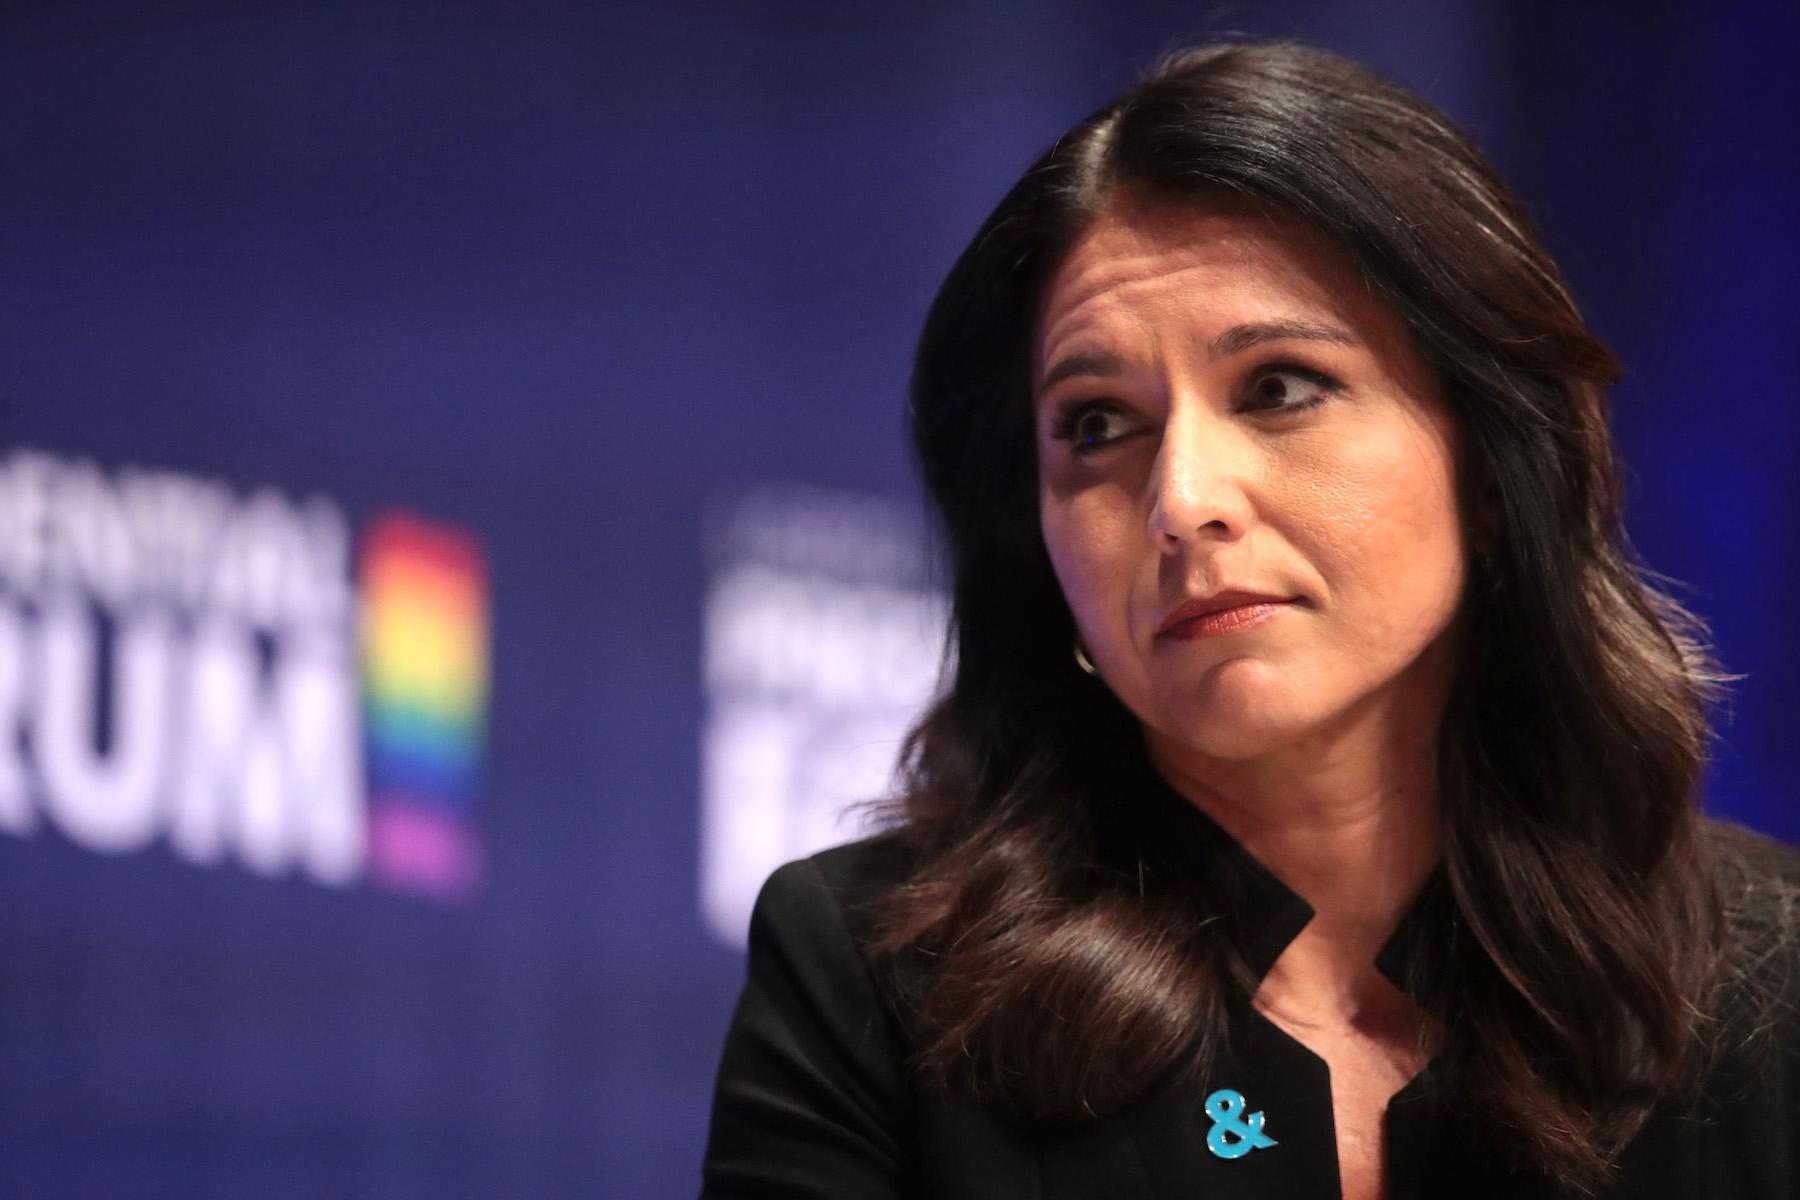 2020 Democrat Candidates Defend Tulsi Gabbard Over 'Russian Asset' Accusations